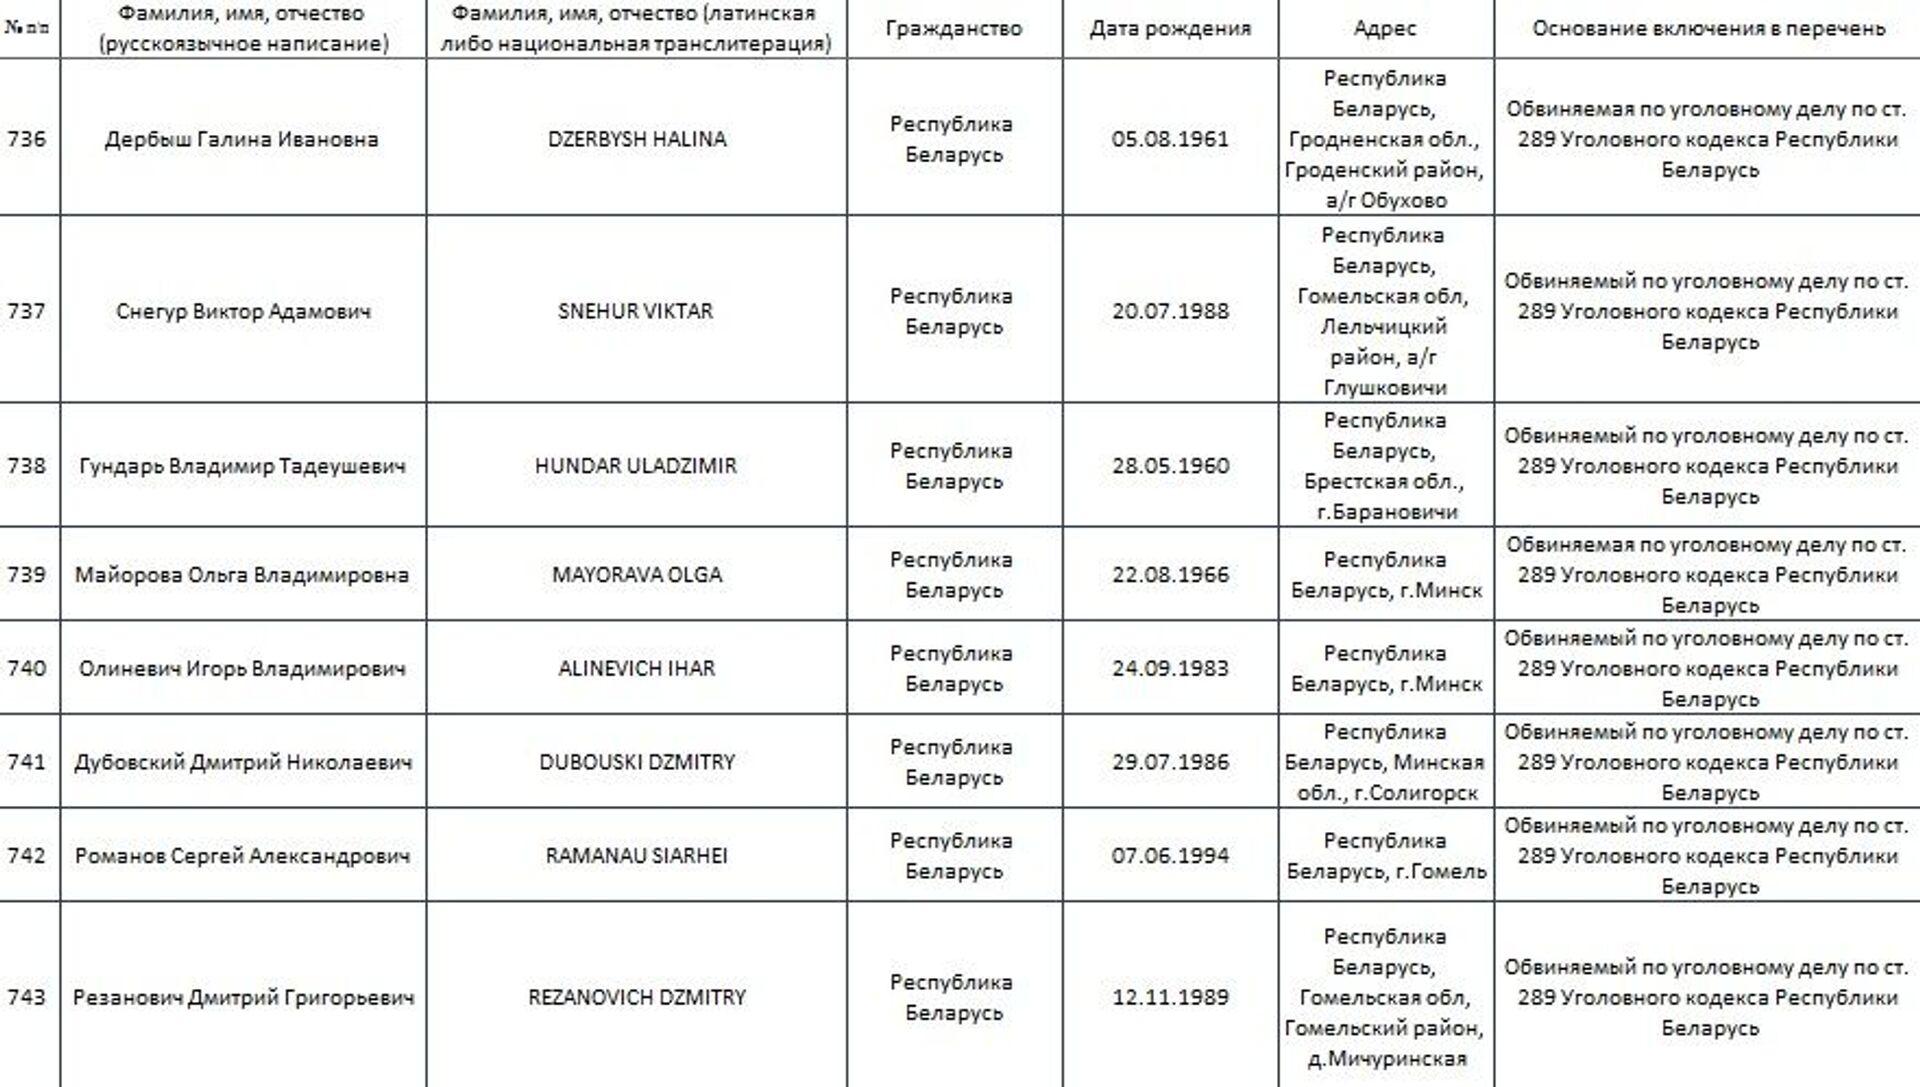 КГБ Беларуси обновил список фамилий обвиненных в терроризме - Sputnik Беларусь, 1920, 15.02.2021